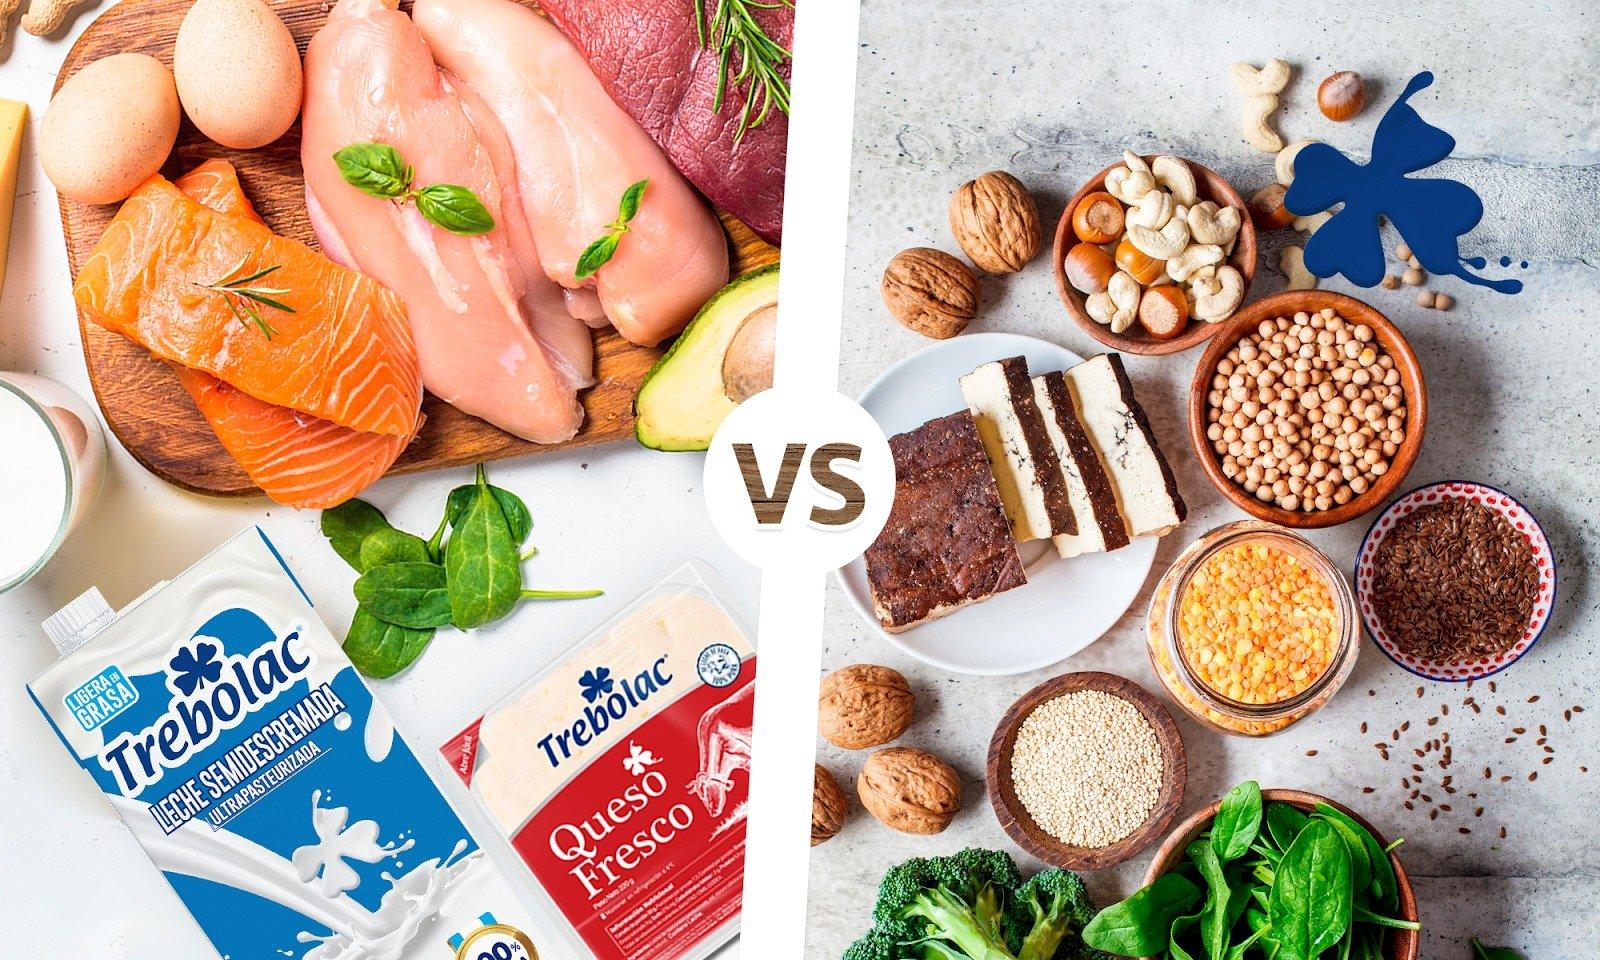 Beneficios de la proteína animal vrs la proteína vegetal.